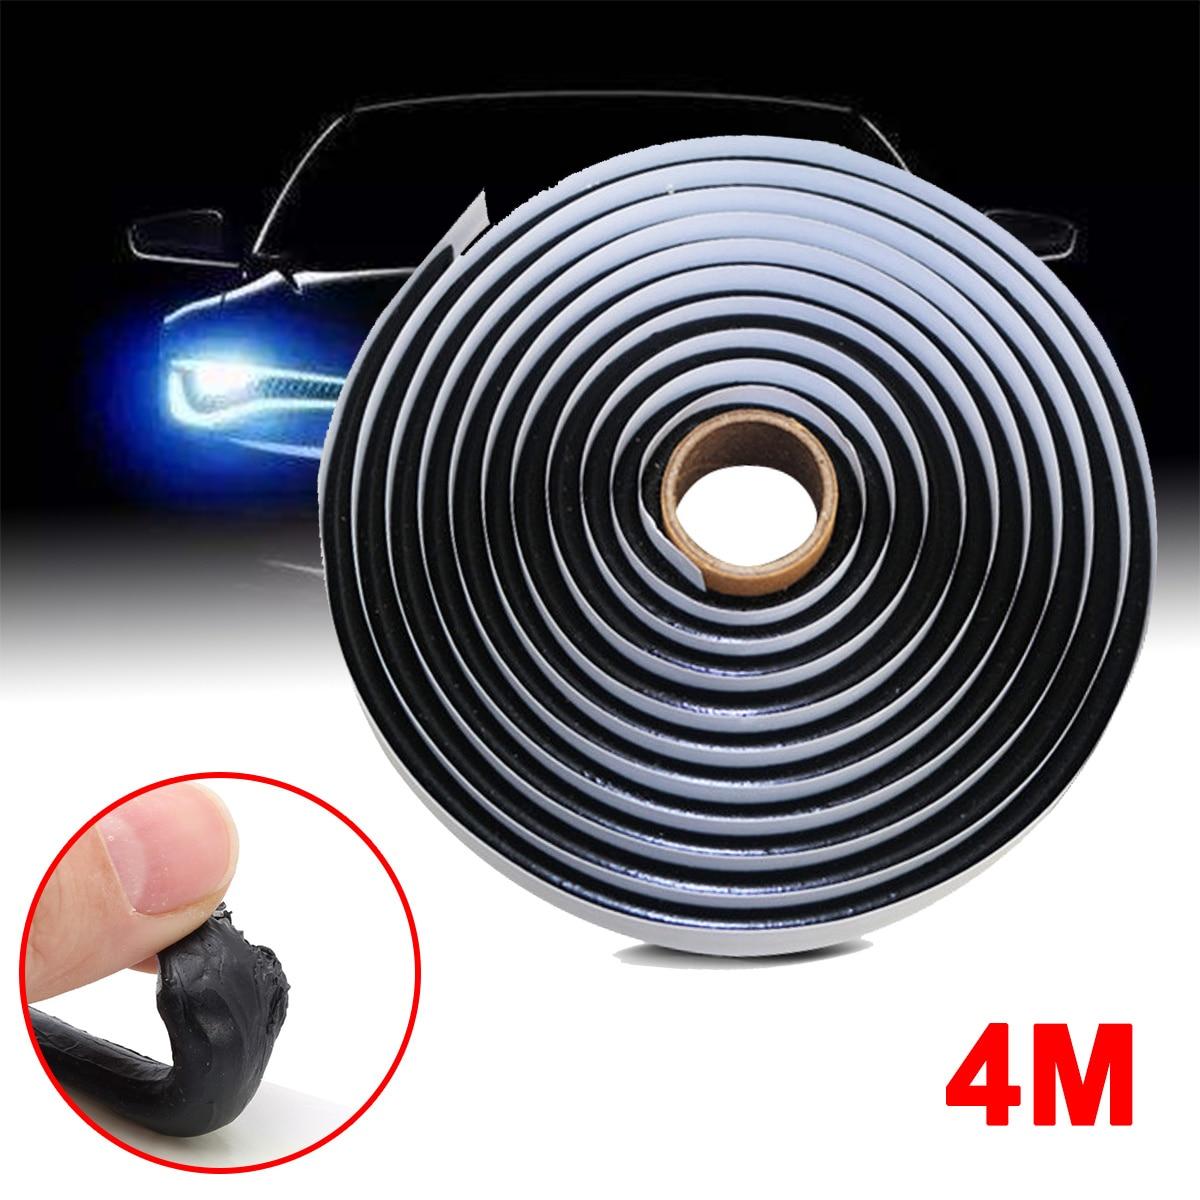 4M Car Truck Headlight LED Retrofit Reseal Strip Black Butyl Rubber Glue Sealant